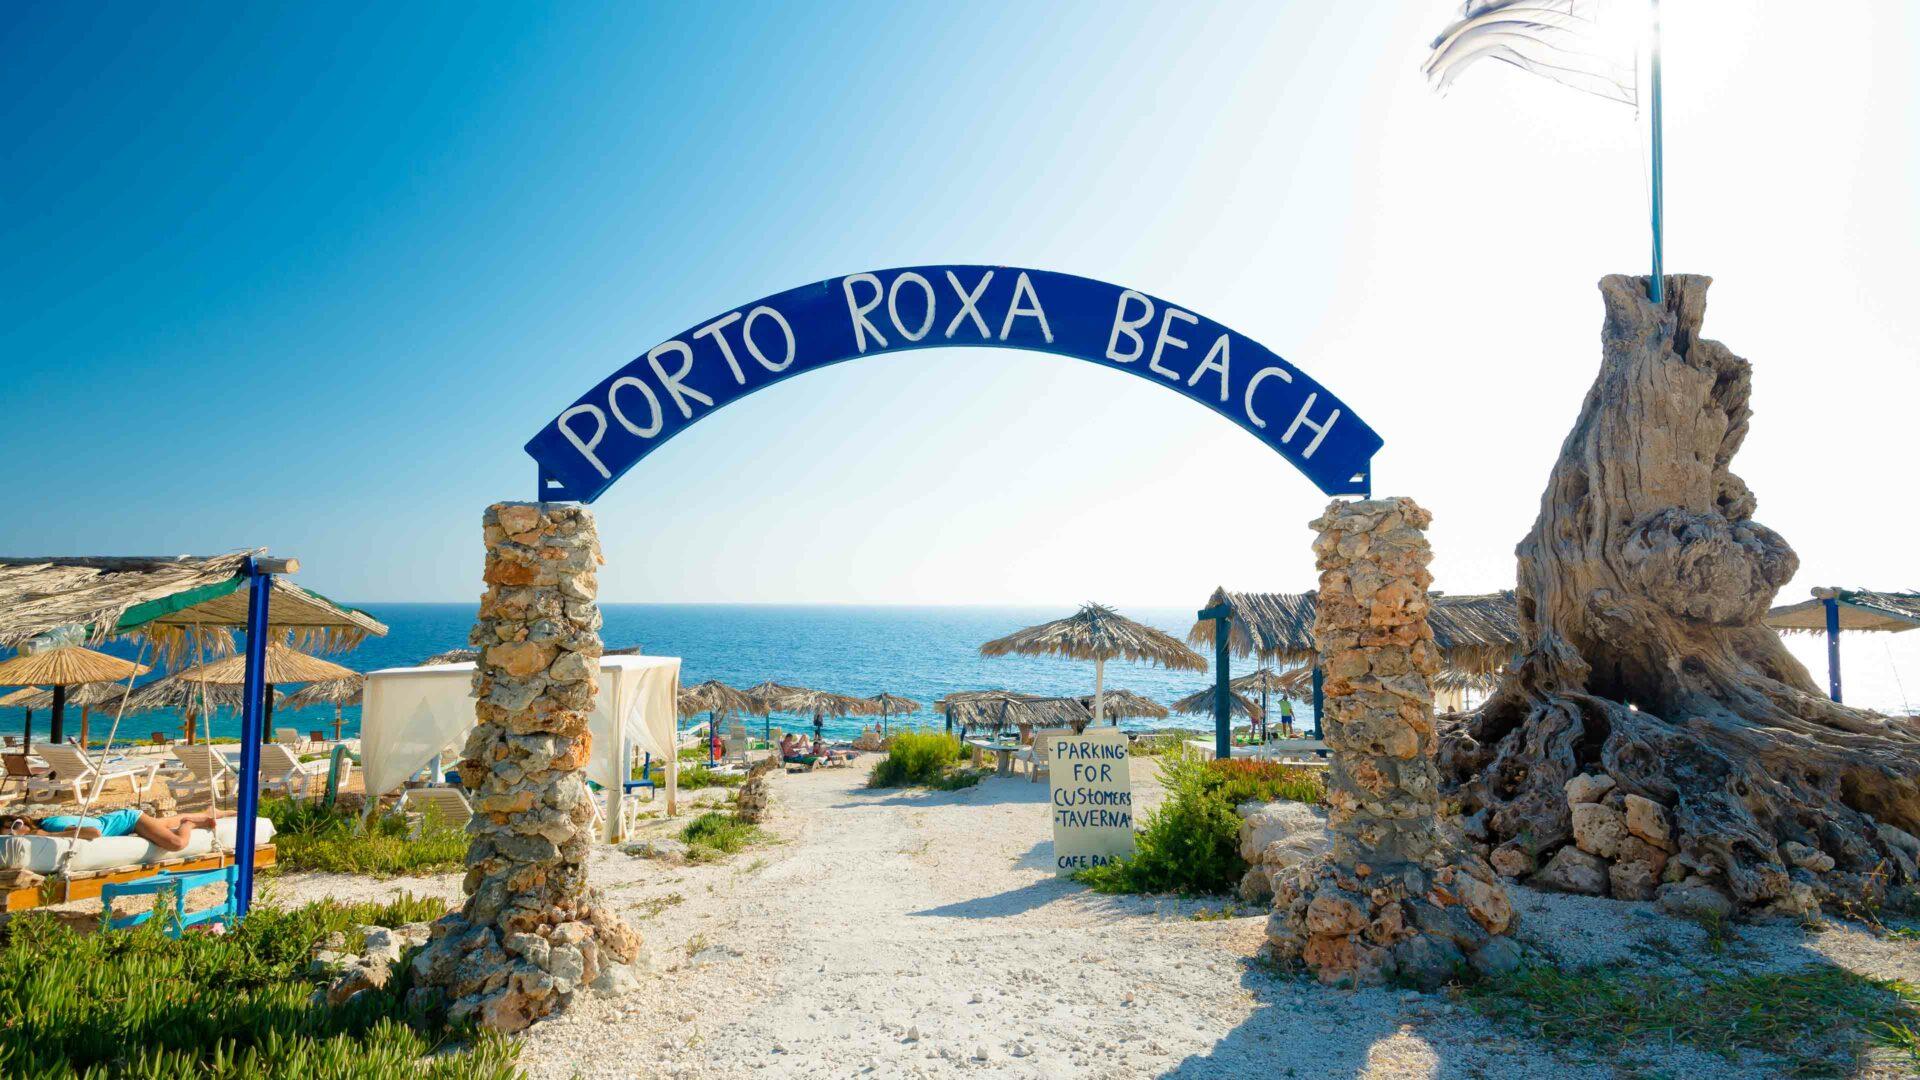 Zakynthos strand Porta Roxa Beach